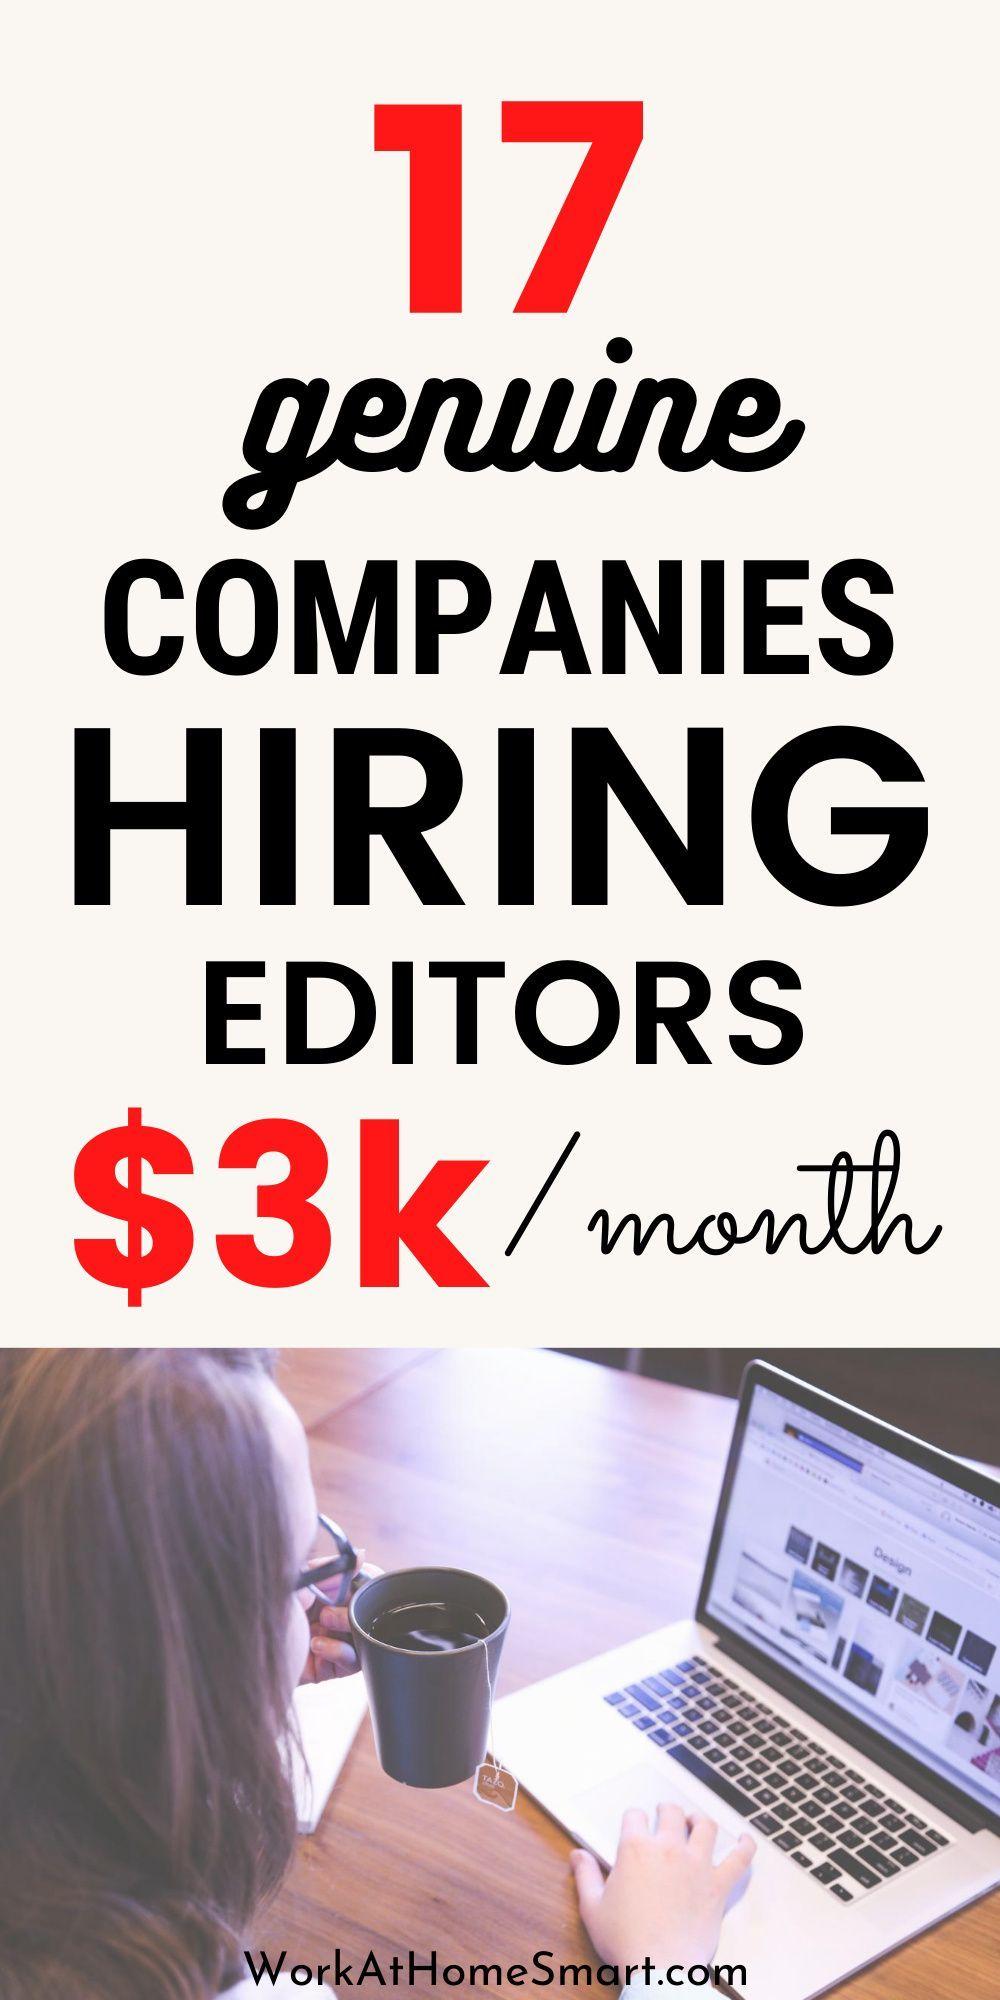 17 Online Editing Jobs 2020 The Best Freelance Editing Jobs In 2020 Editing Jobs Online Editing Jobs Freelance Editing